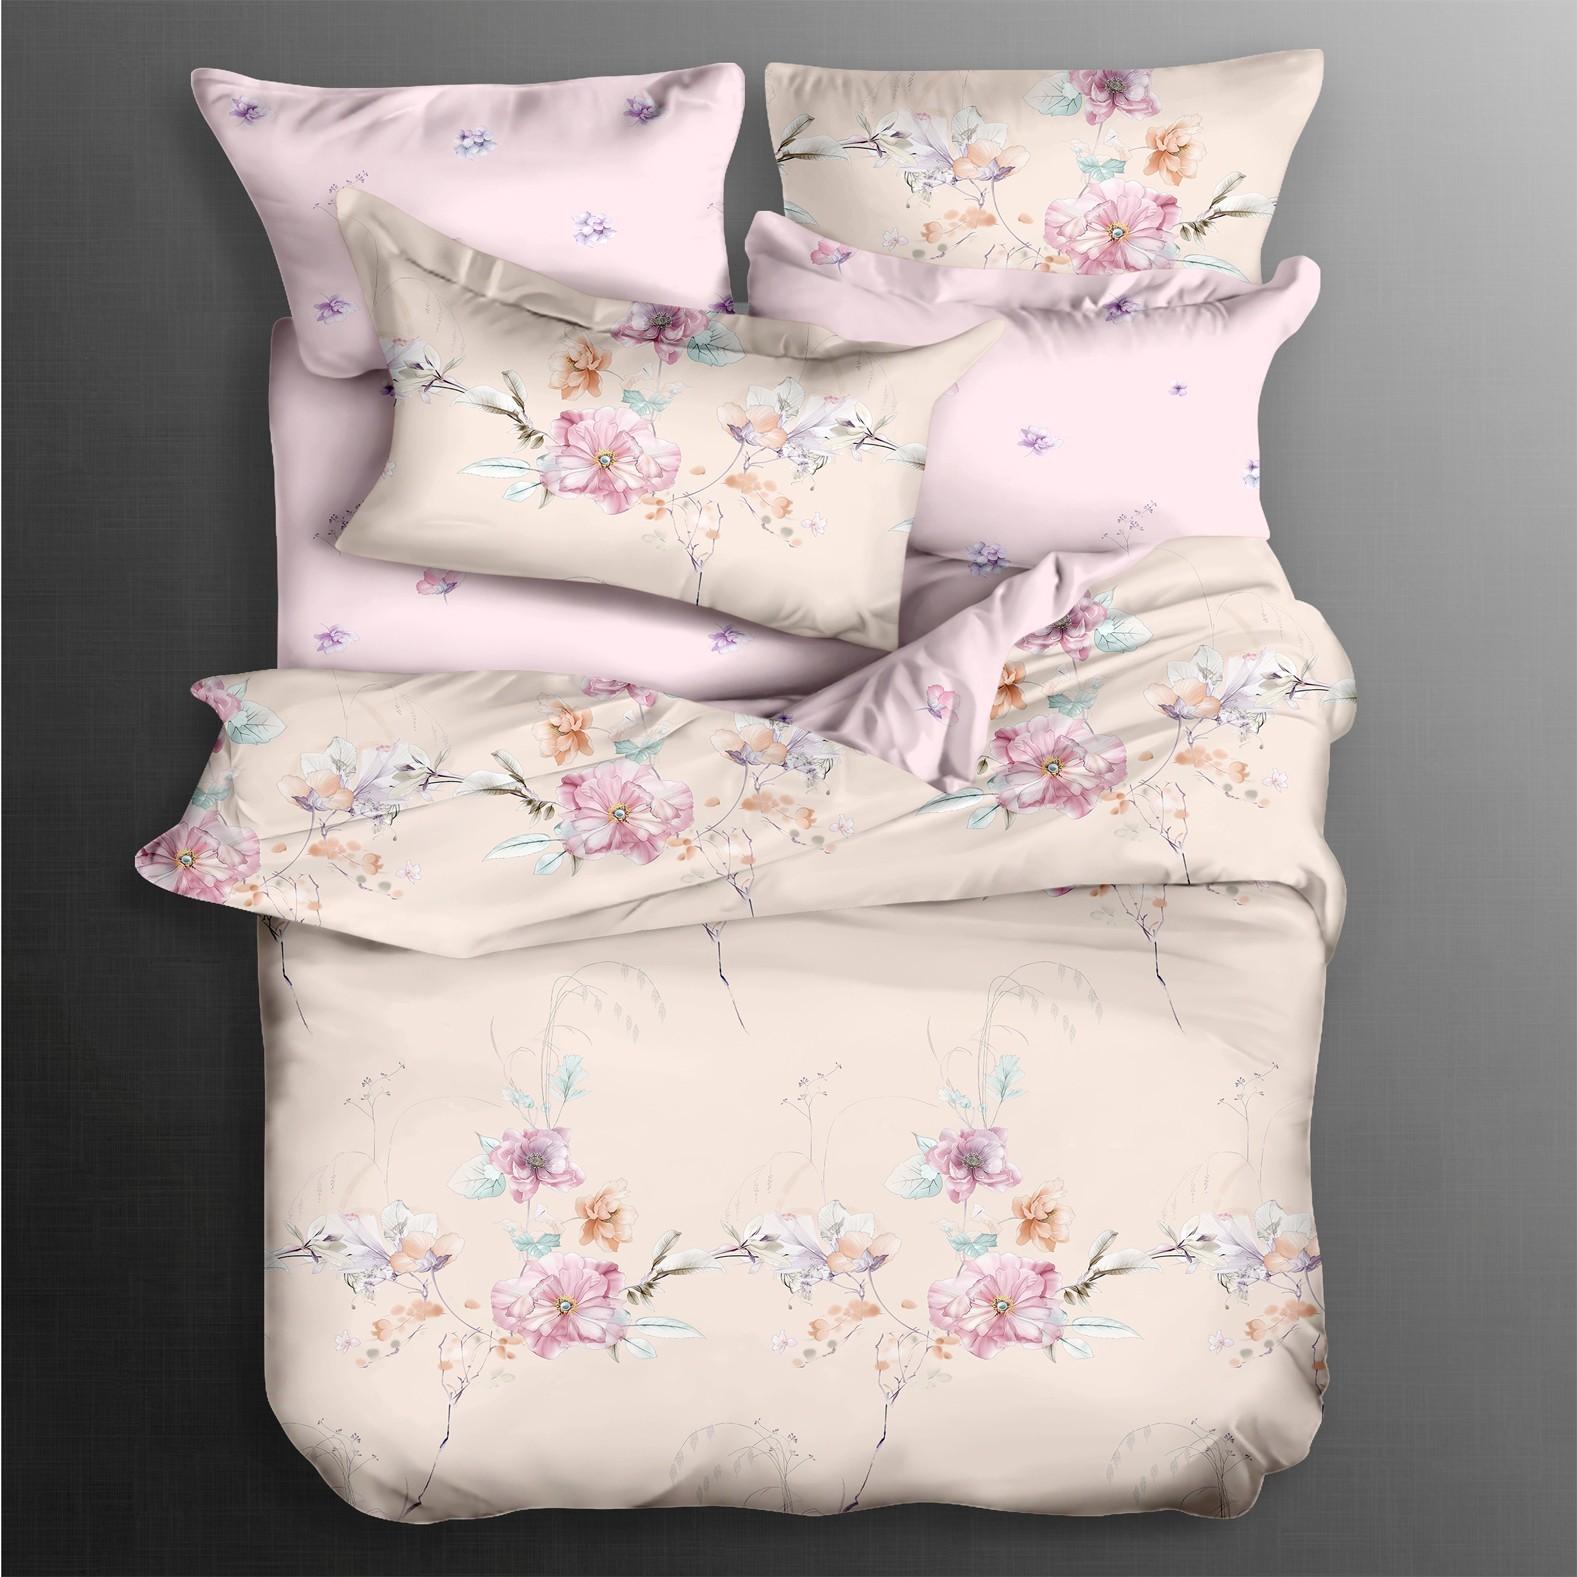 printed daphne 100 cotton bedding sets Daphne